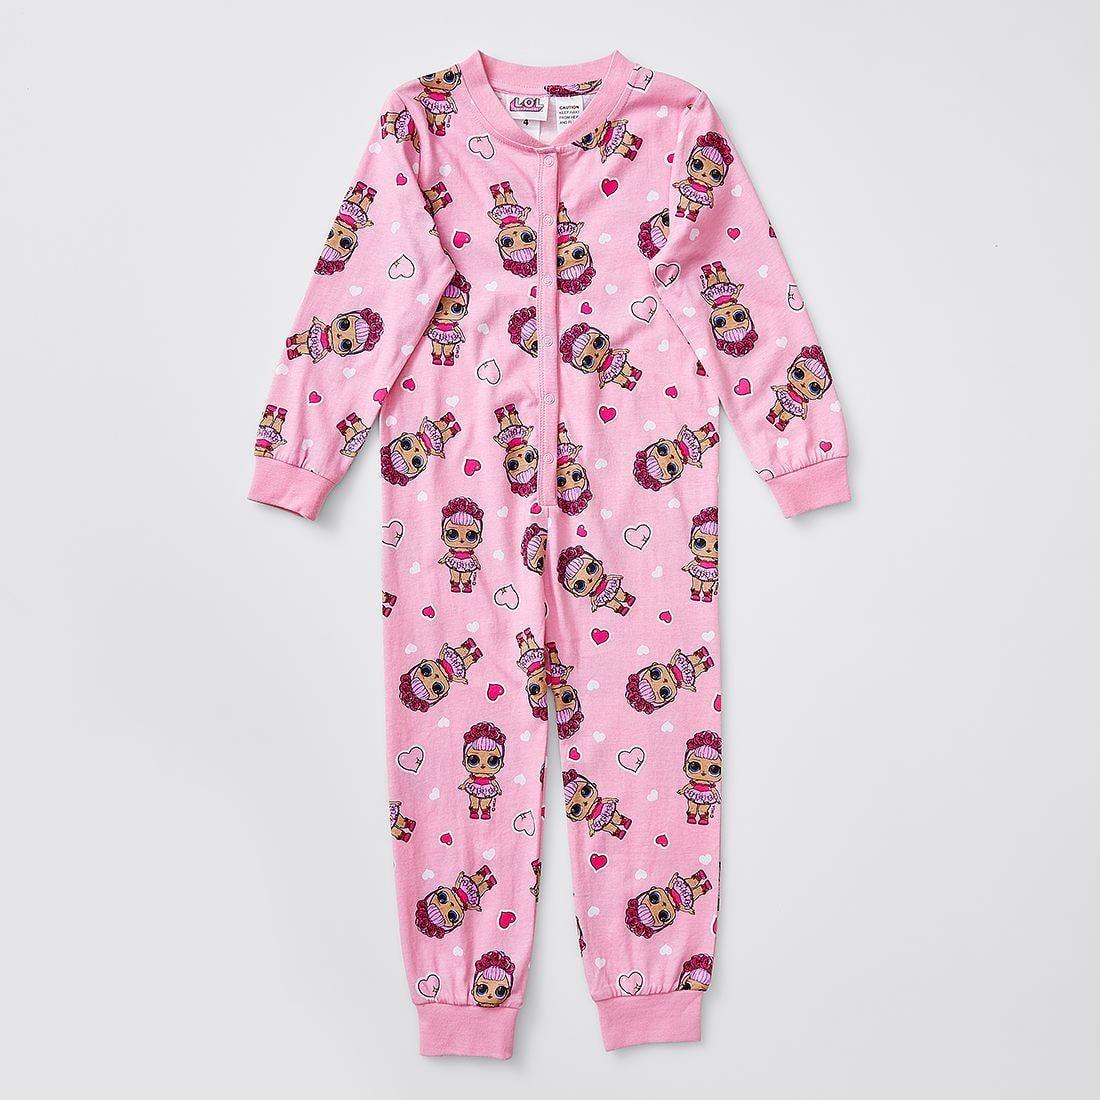 L.O.L. Surprise! Print Sleepsuit Print, Kids sleepwear